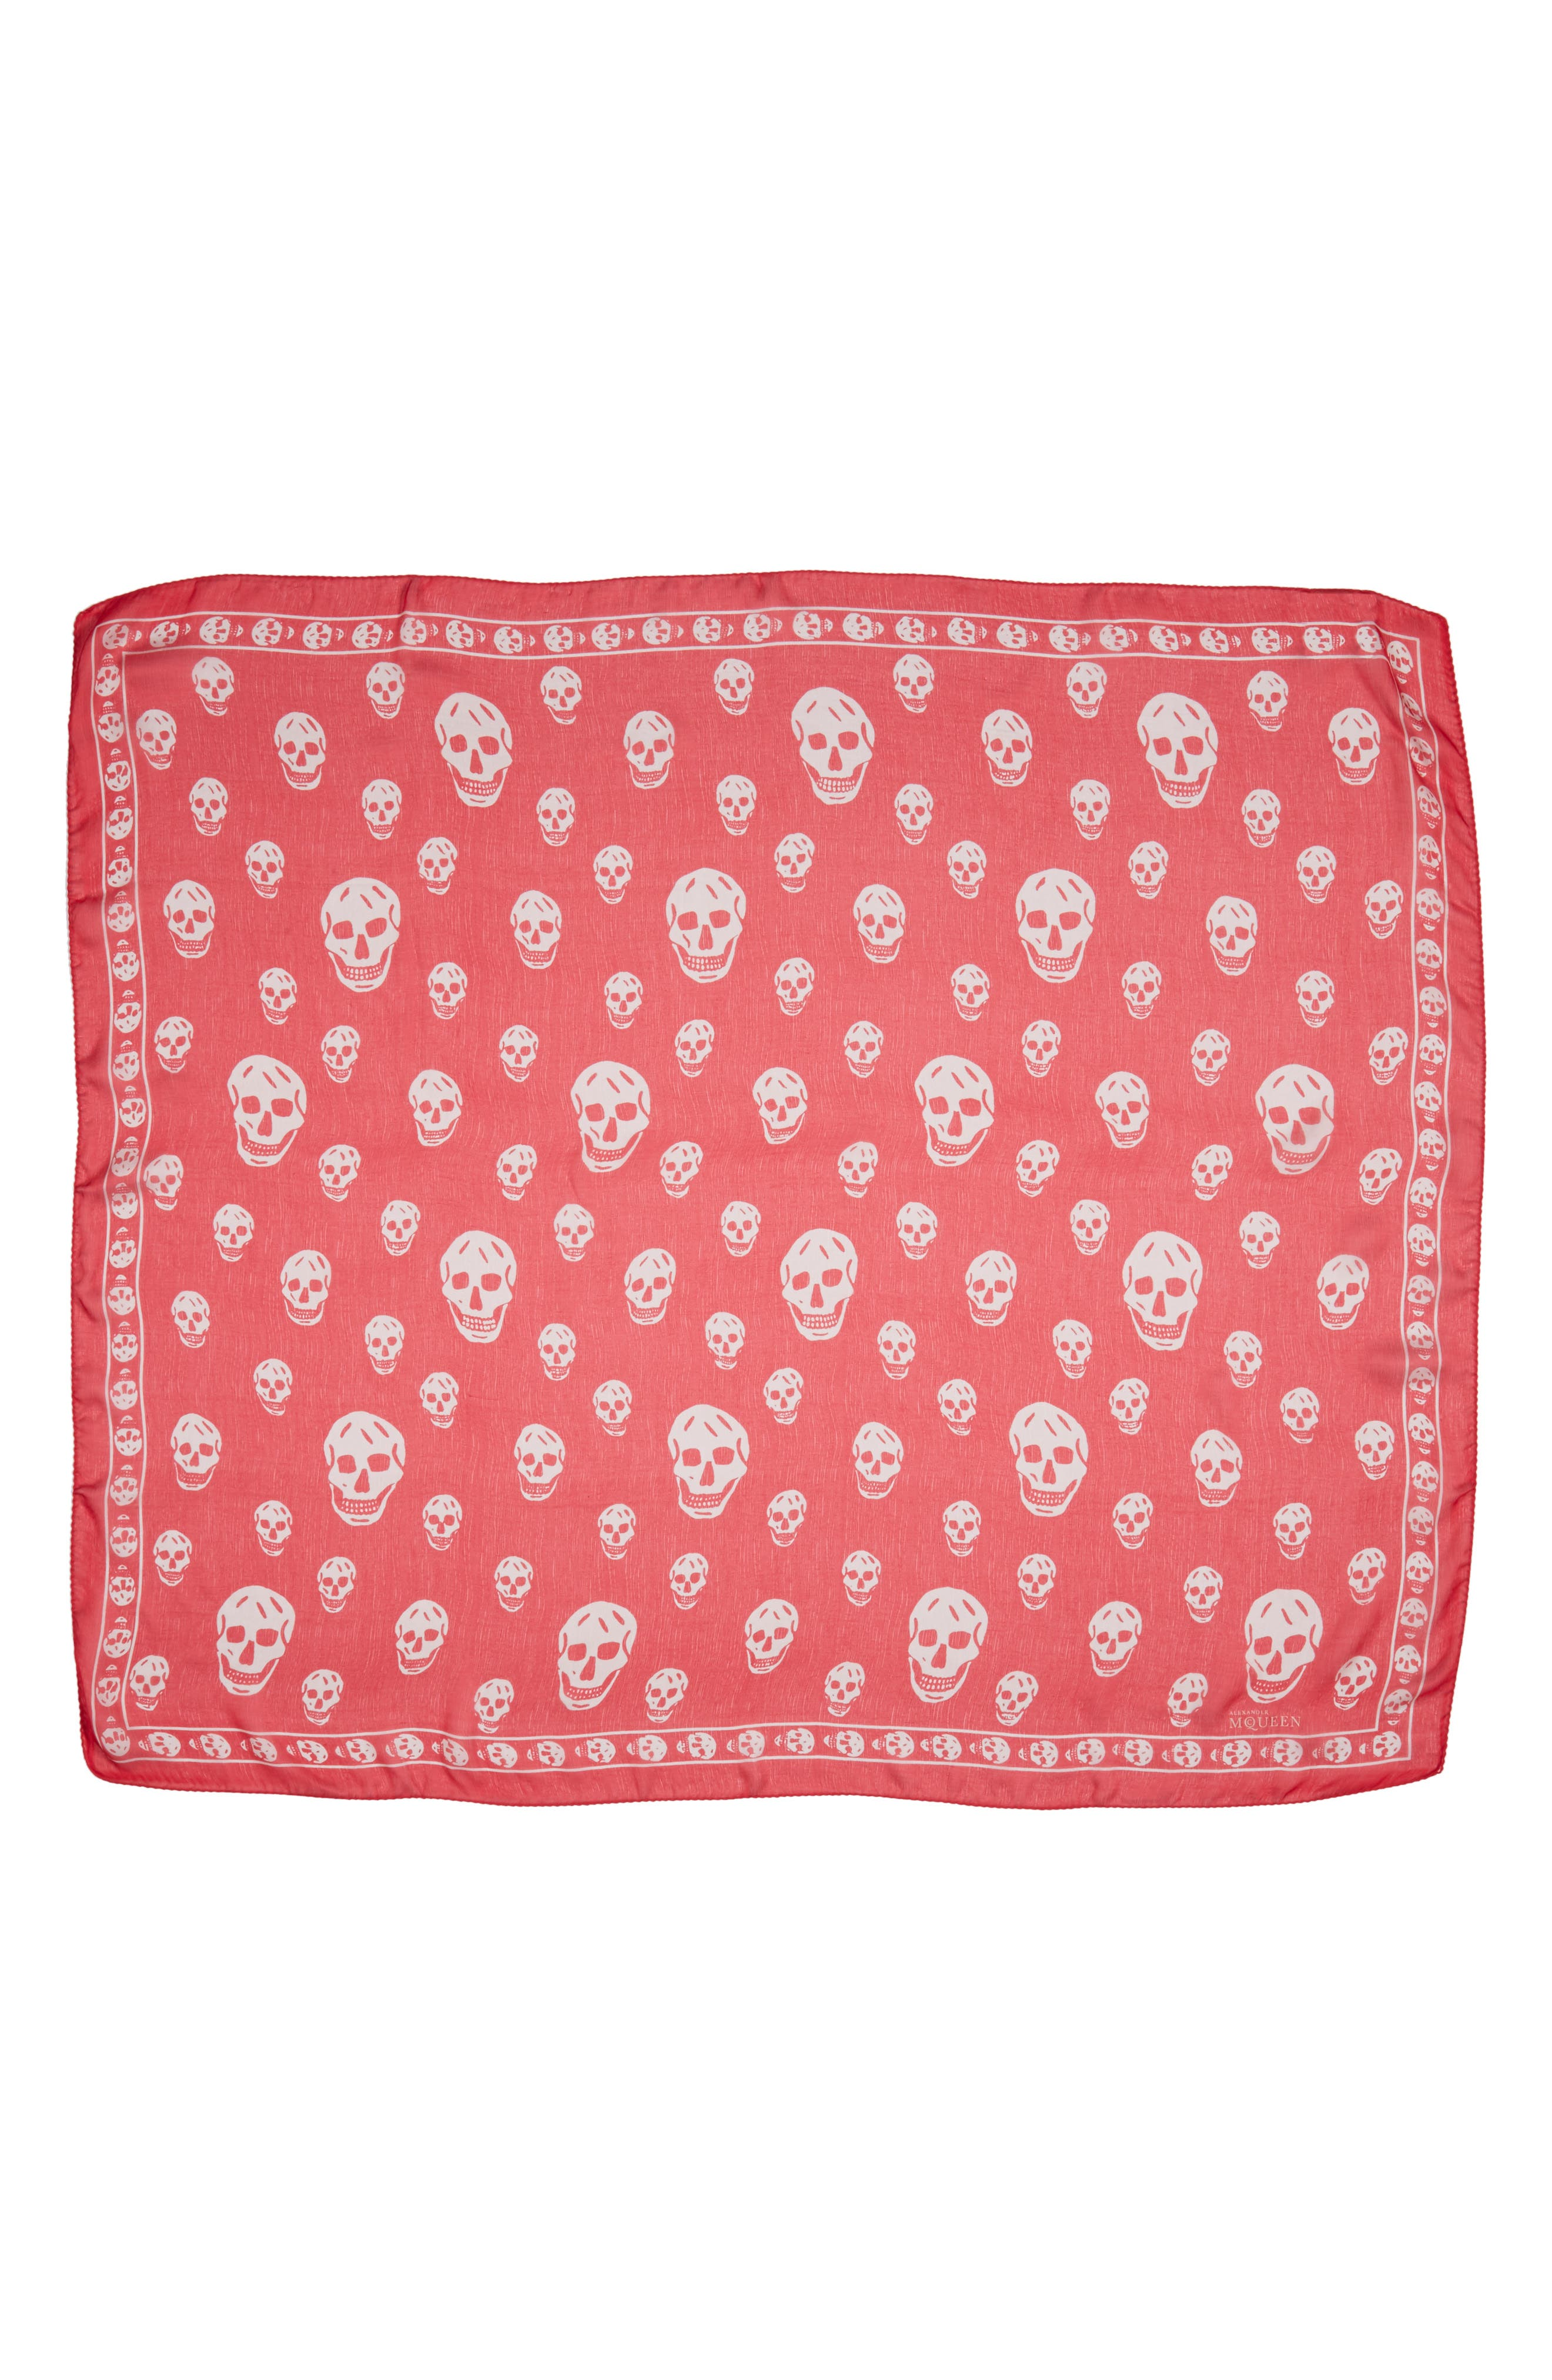 'Skull' Chiffon Scarf, Main, color, CORAL/ BEIGE